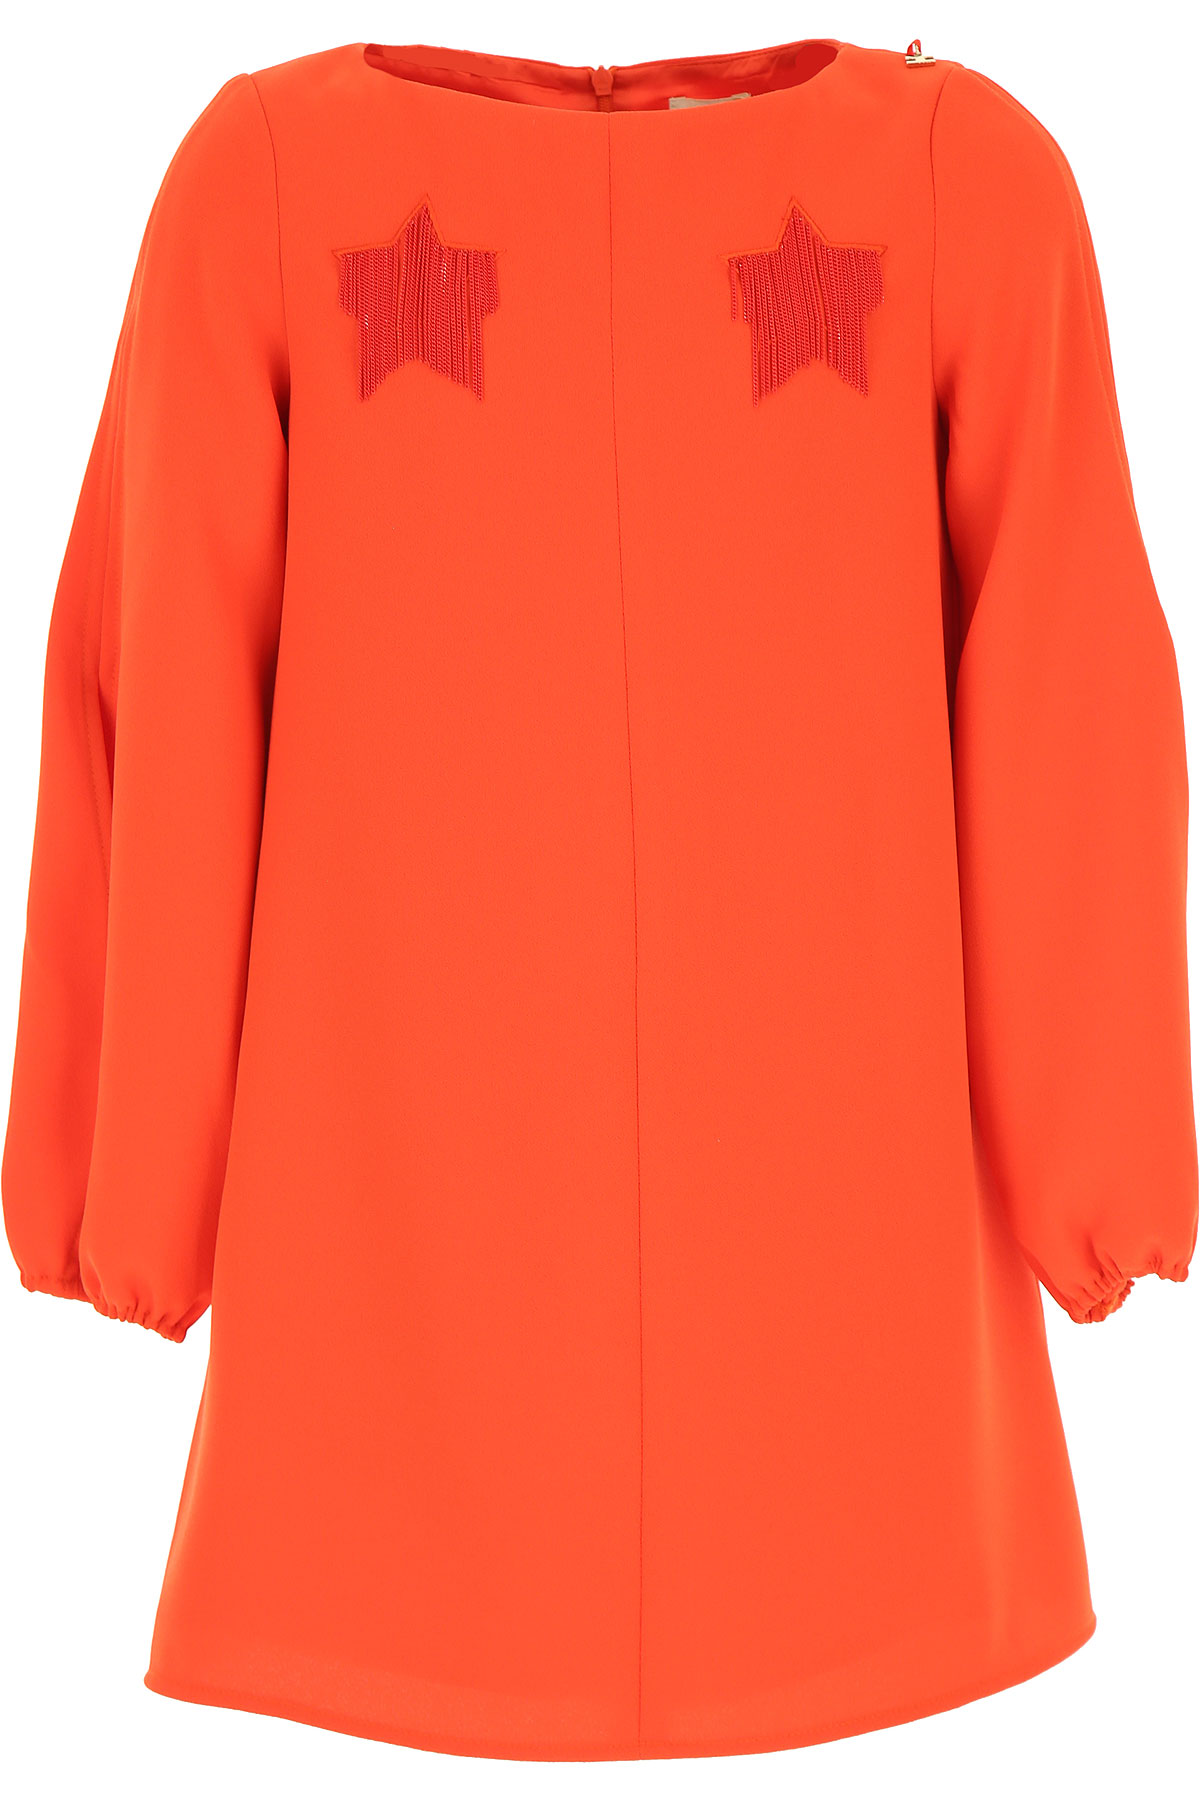 Elisabetta Franchi Girls Dress On Sale, Coral, polyester, 2019, L M XL